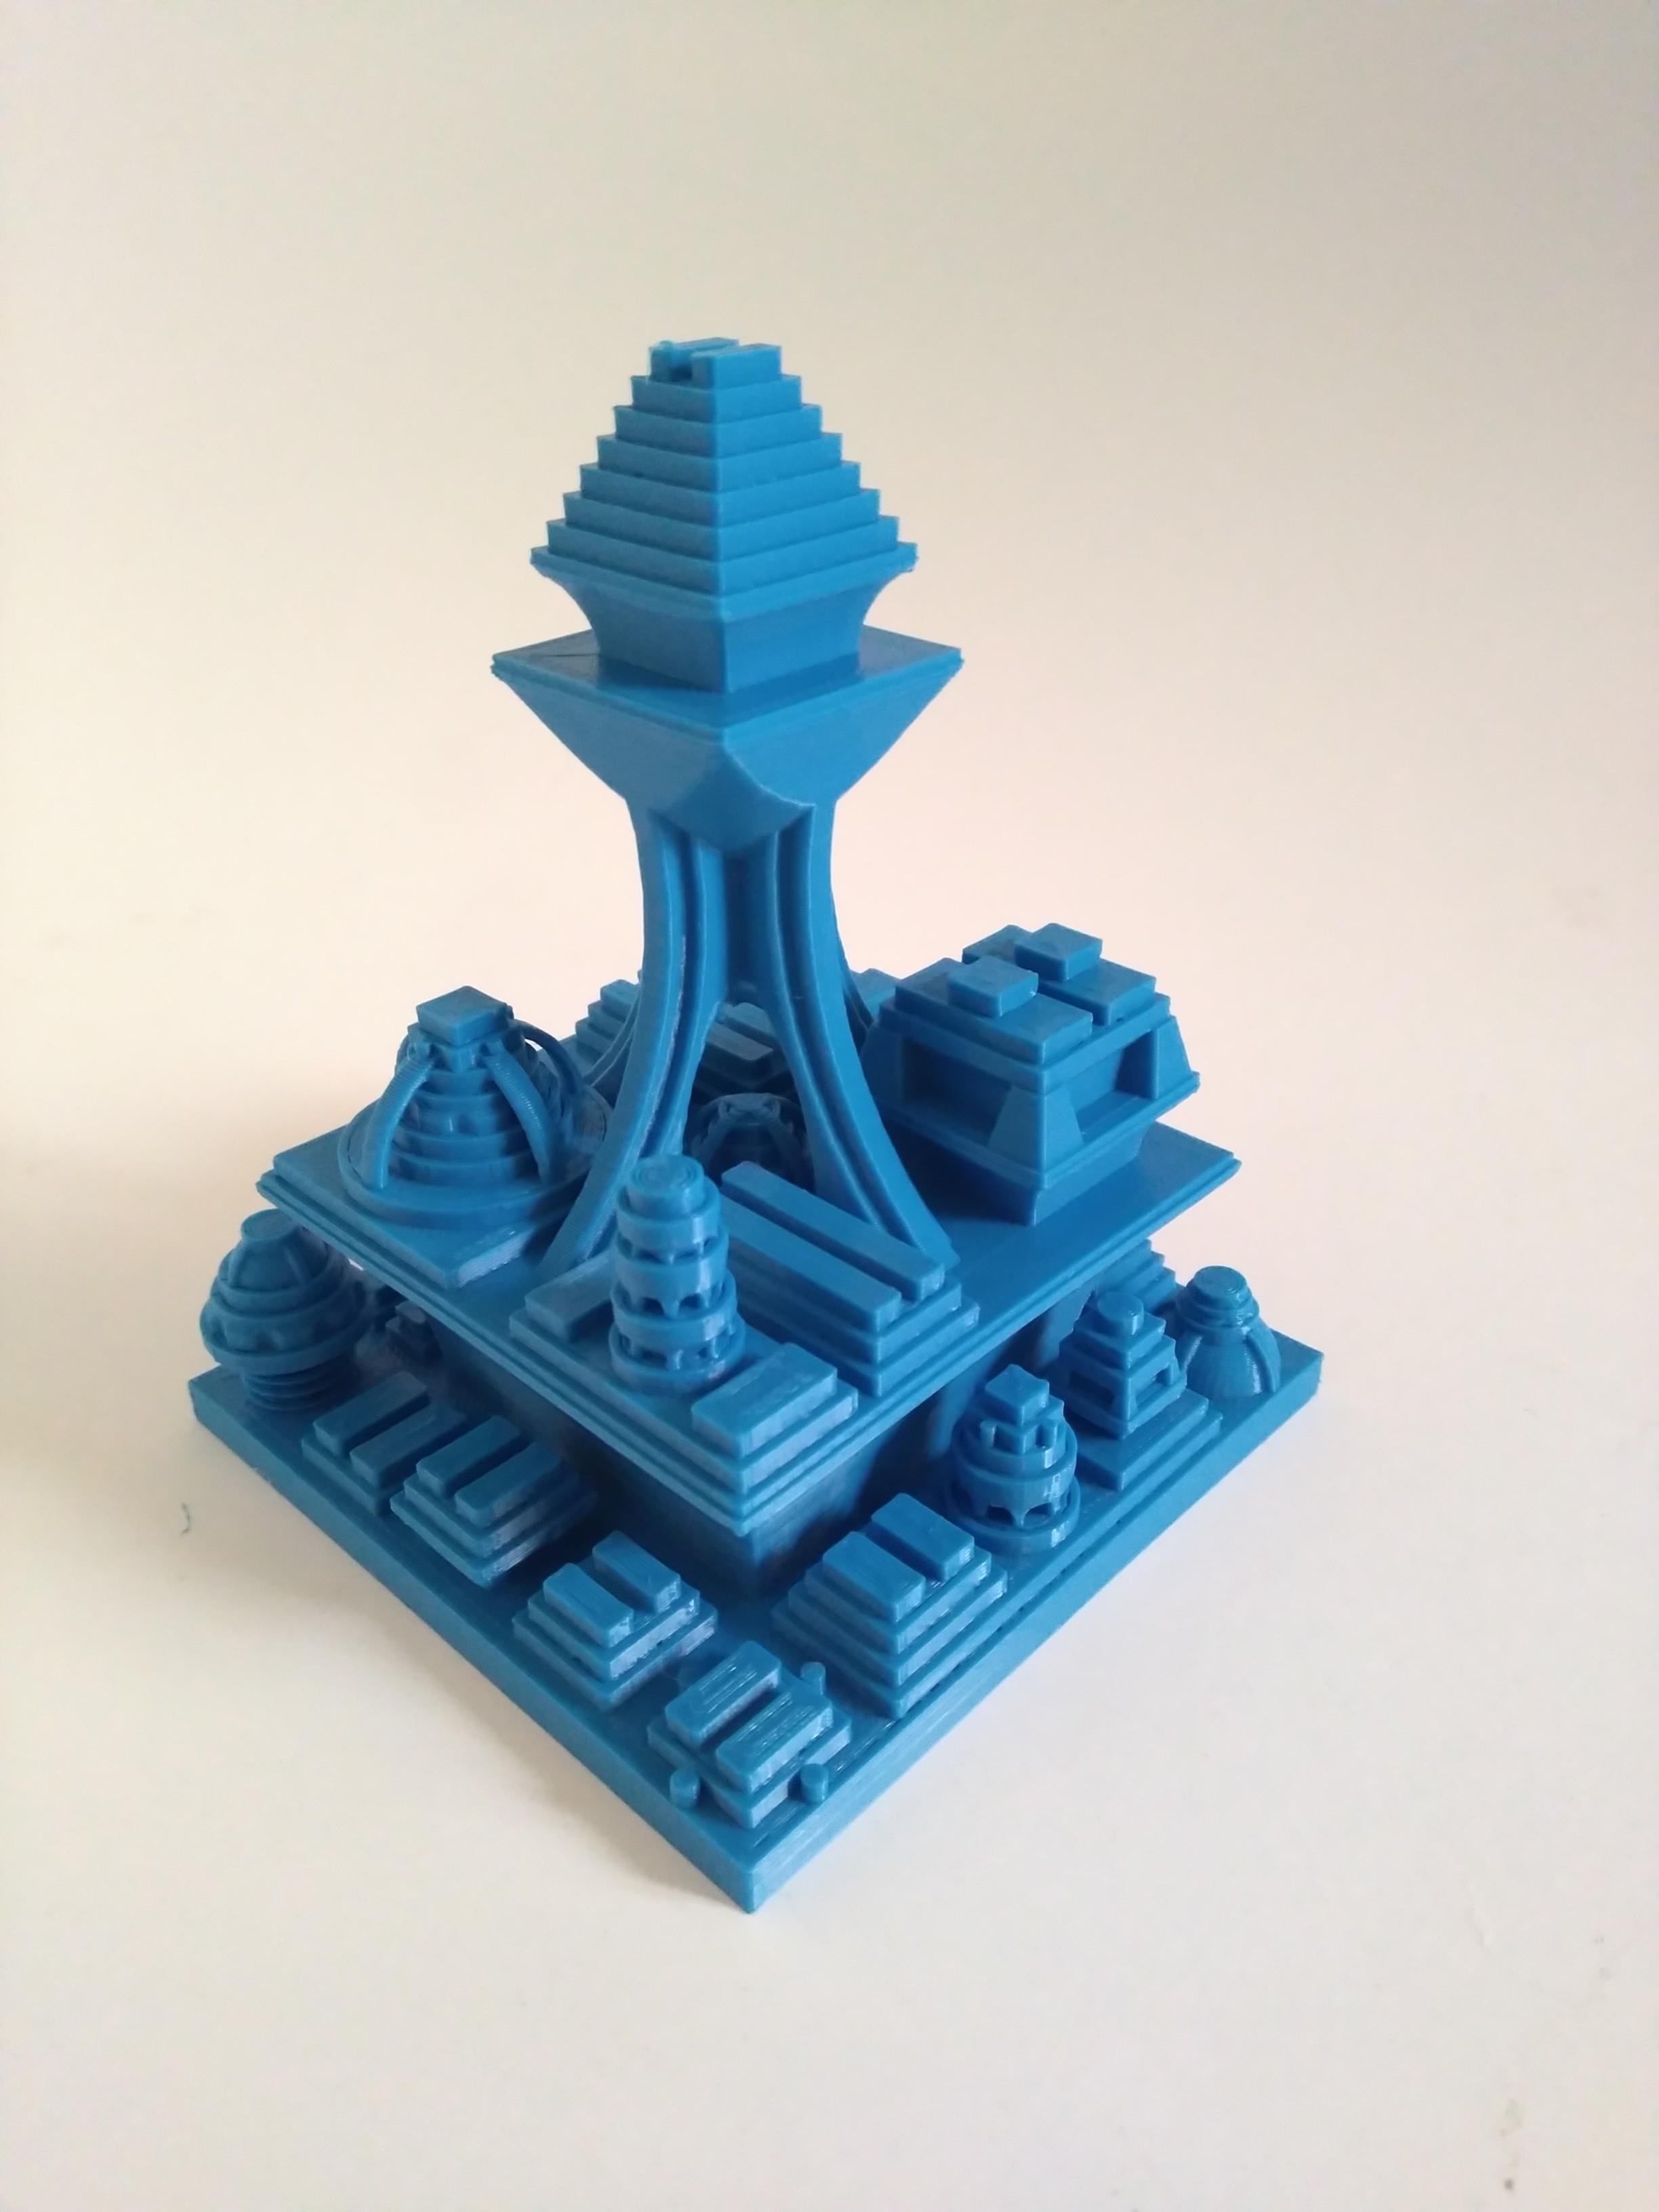 IMG_20180719_181038.jpg Download free STL file Space Cities Generator • 3D print model, ferjerez3d